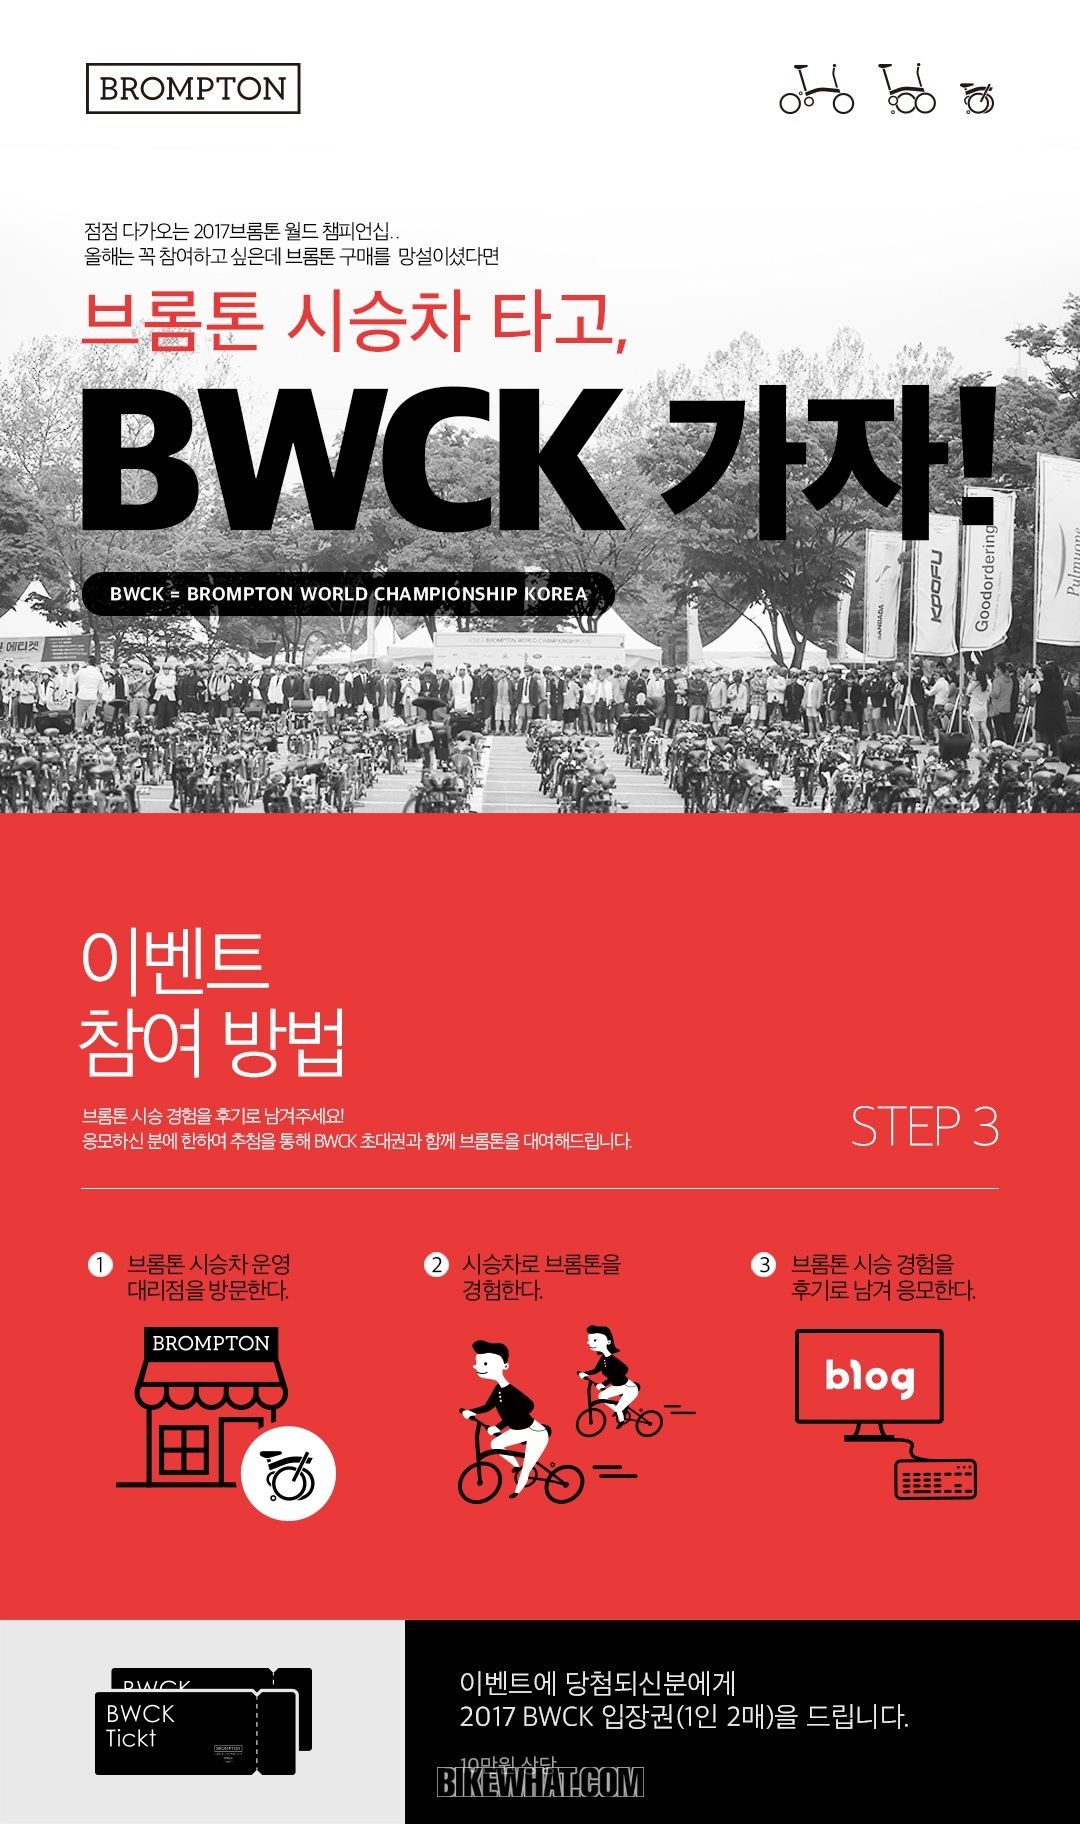 news_BWCK_event_1.jpg